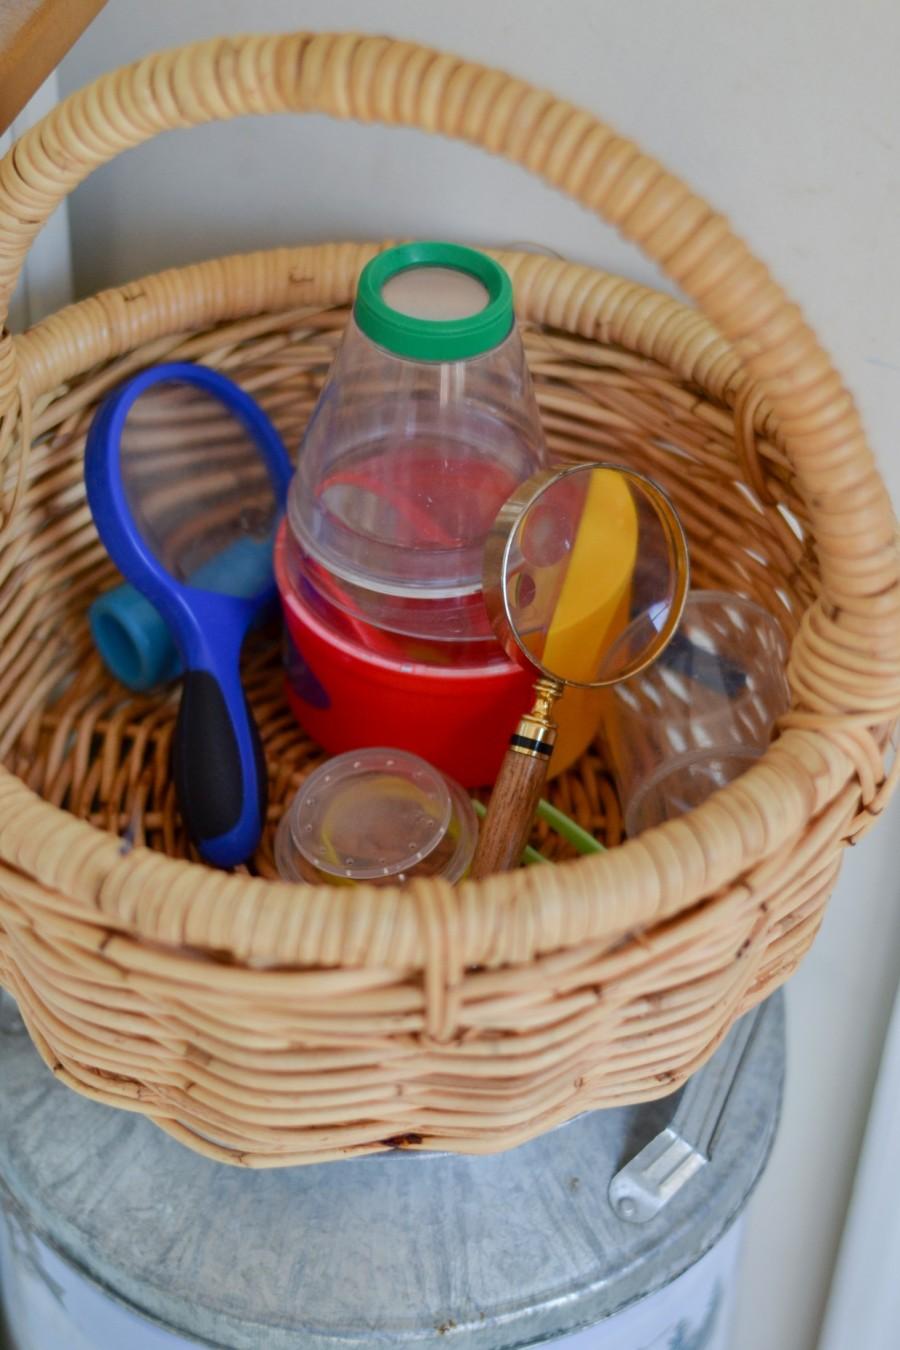 Summer Simplification: - Abby Sasscer | Basket of Exploration Supplies